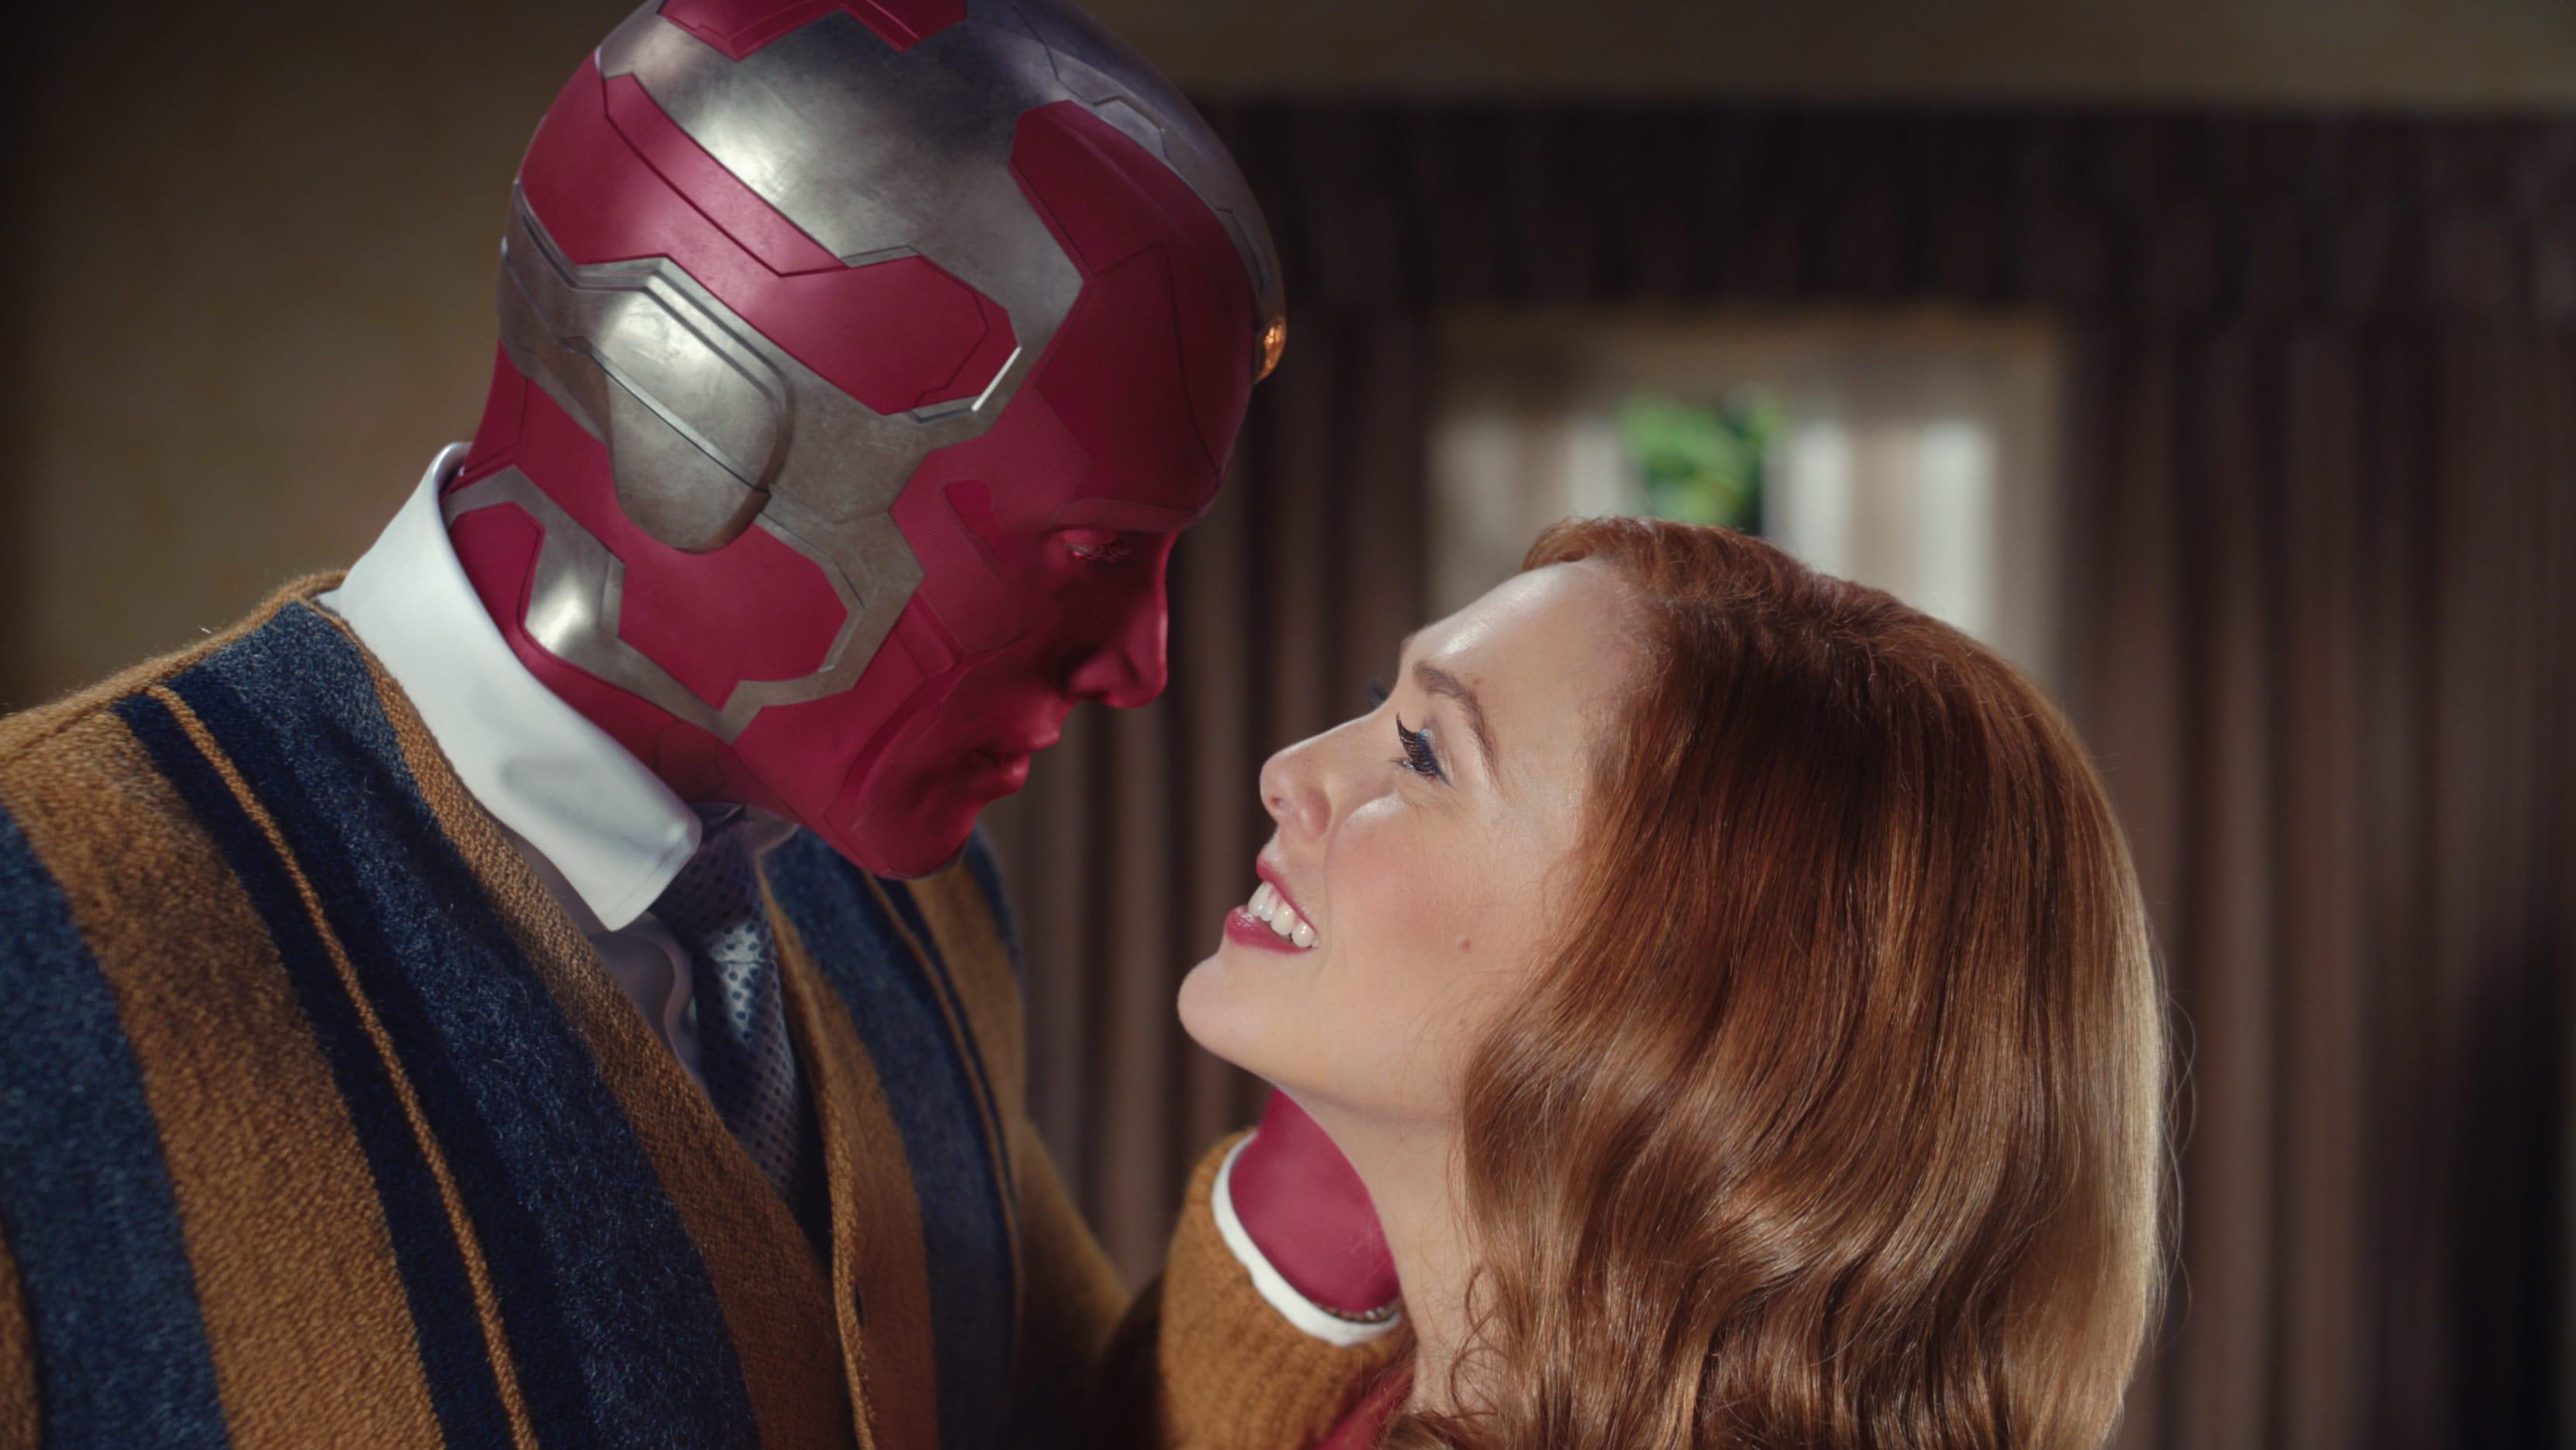 Paul Bettany and Elizabeth Olsen in 'Wandavision'